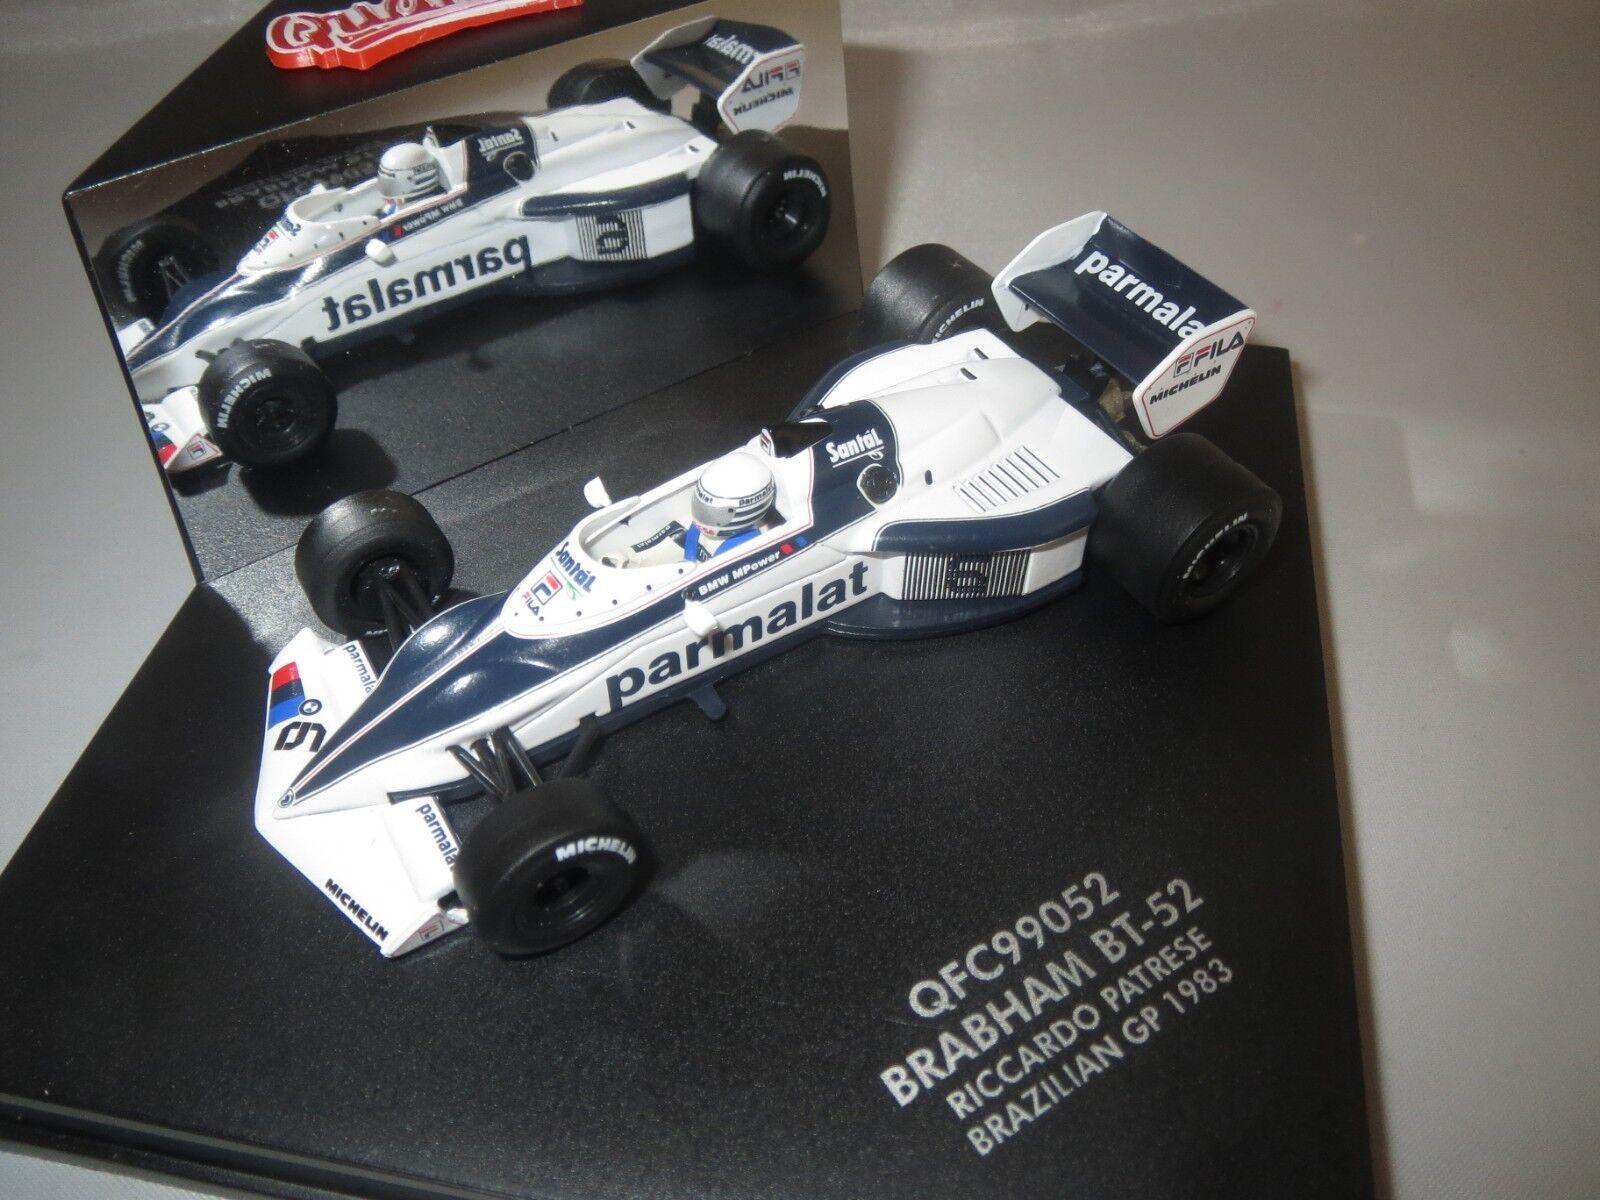 Vitesse quartzo qfc99052 Braham bt-52 Patrese) (R. Patrese) bt-52 Brazilian GP  6  1983  1 43 3d05a1